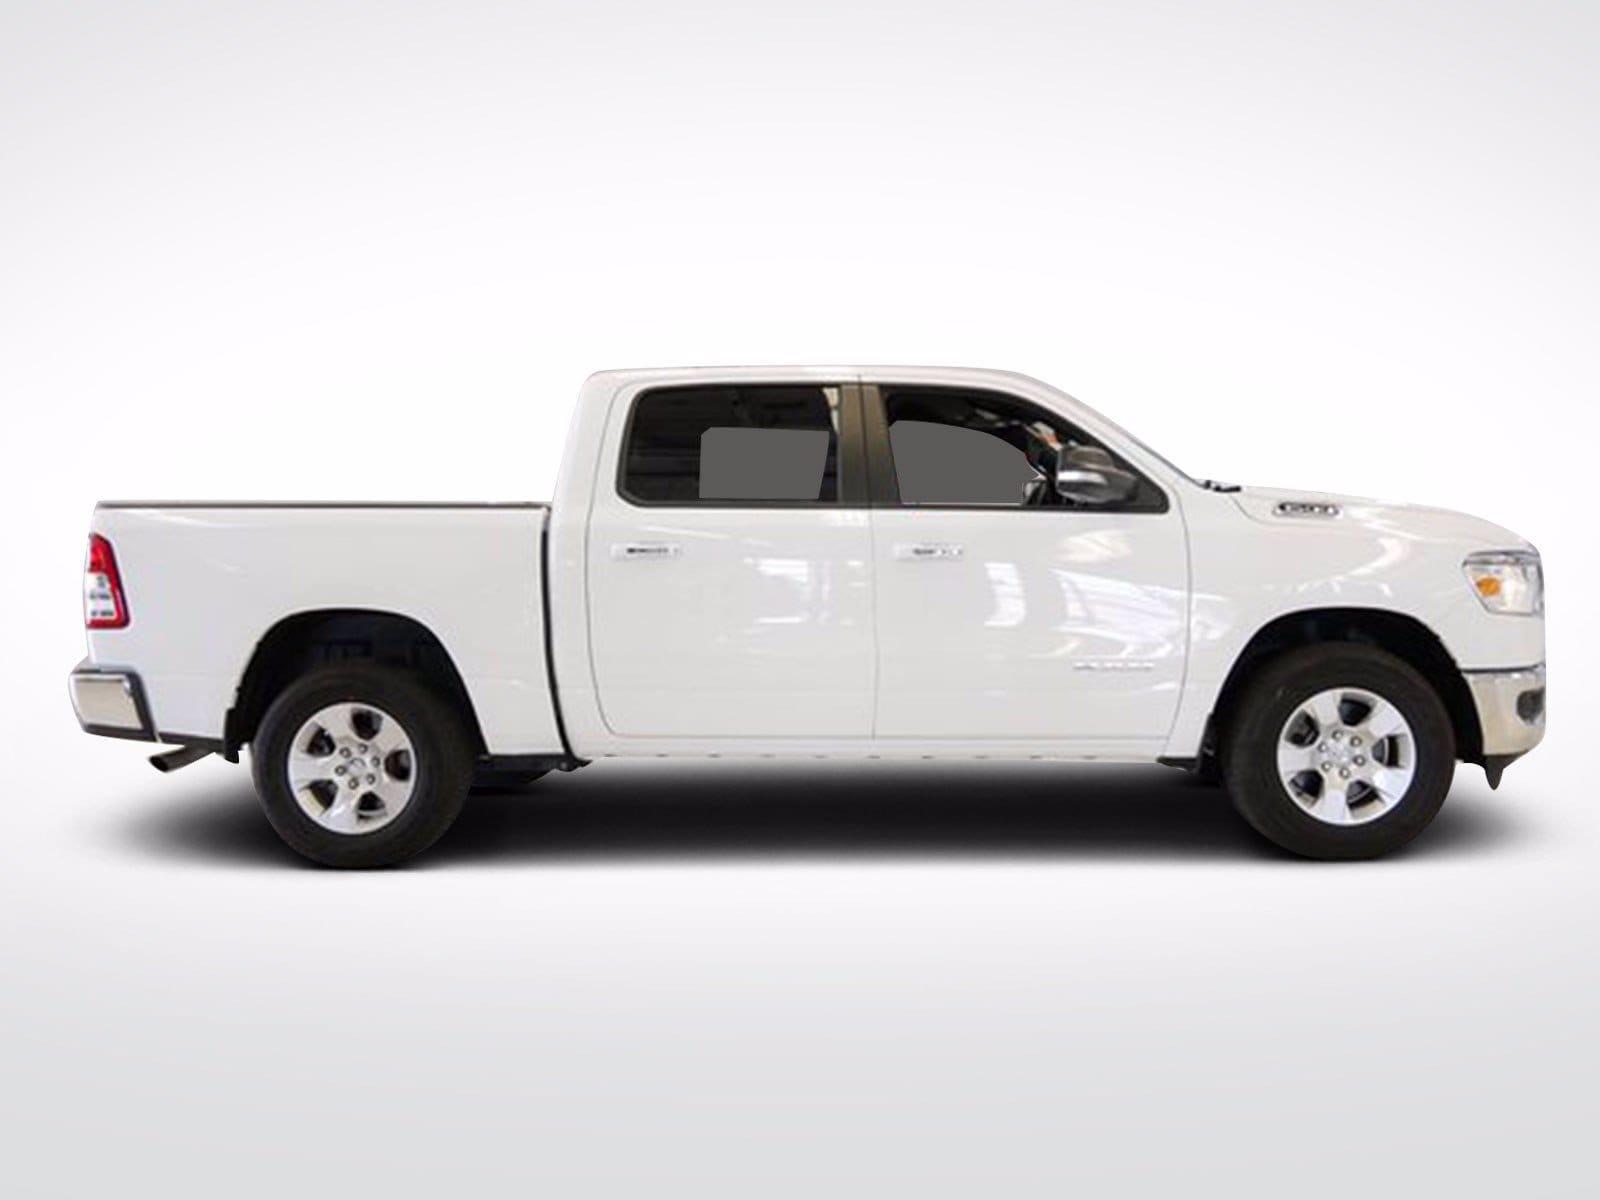 Used 2019 RAM Ram 1500 Pickup Big Horn/Lone Star with VIN 1C6RRFFG1KN879140 for sale in Willmar, Minnesota